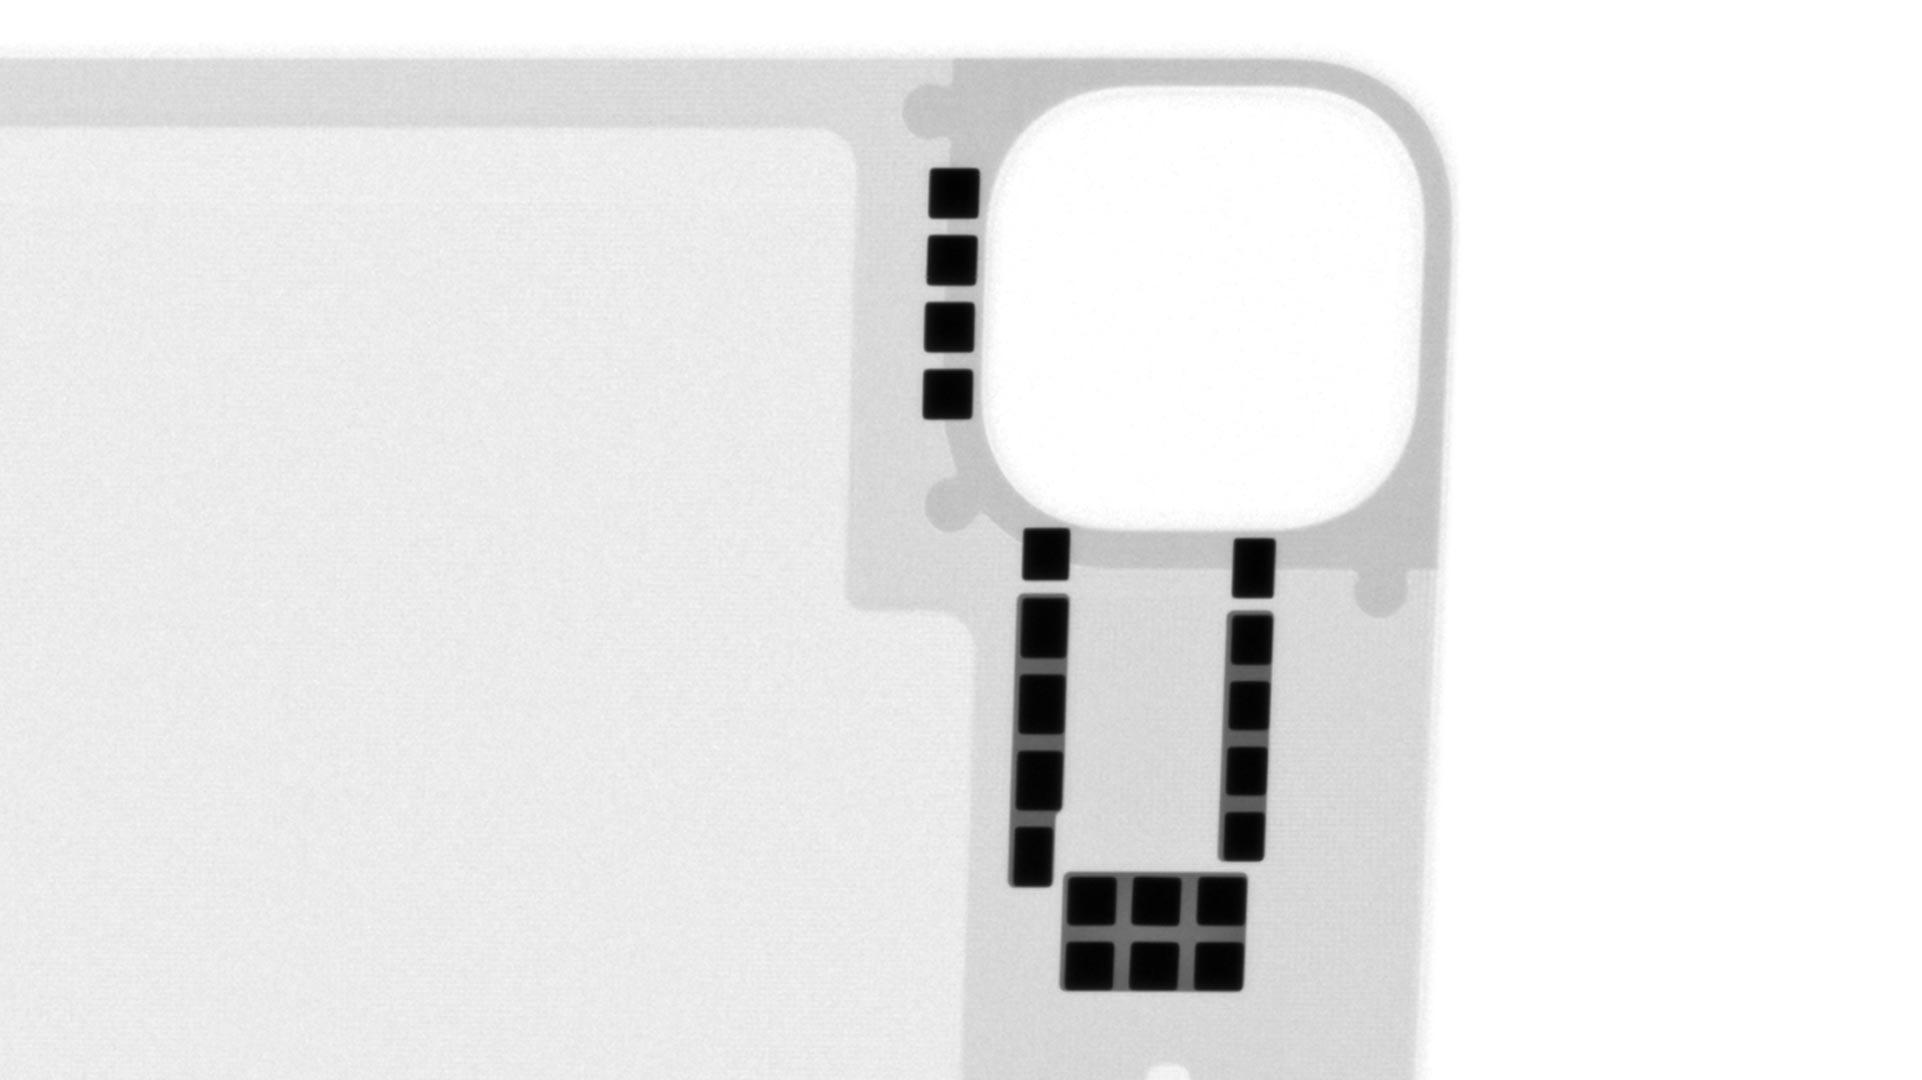 Magic Keyboard iPad Pro X-ray magnets